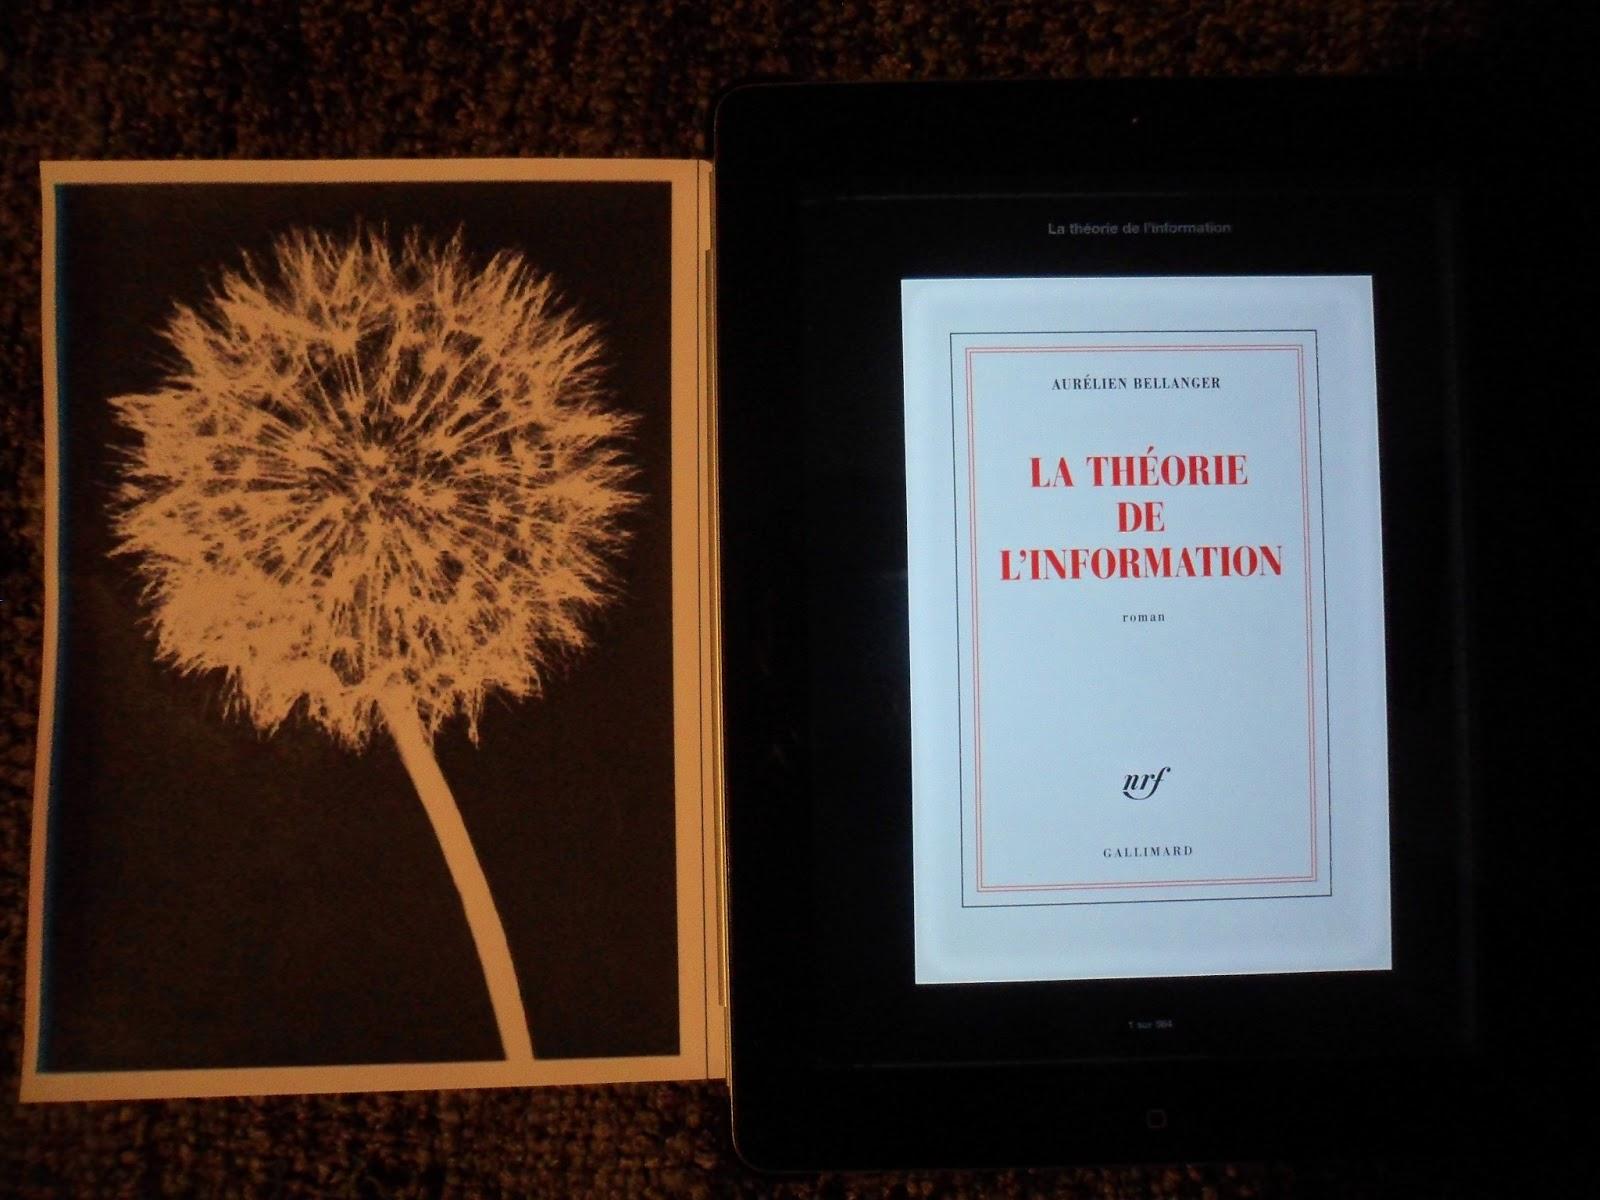 http://blowawaydandelion.blogspot.fr/